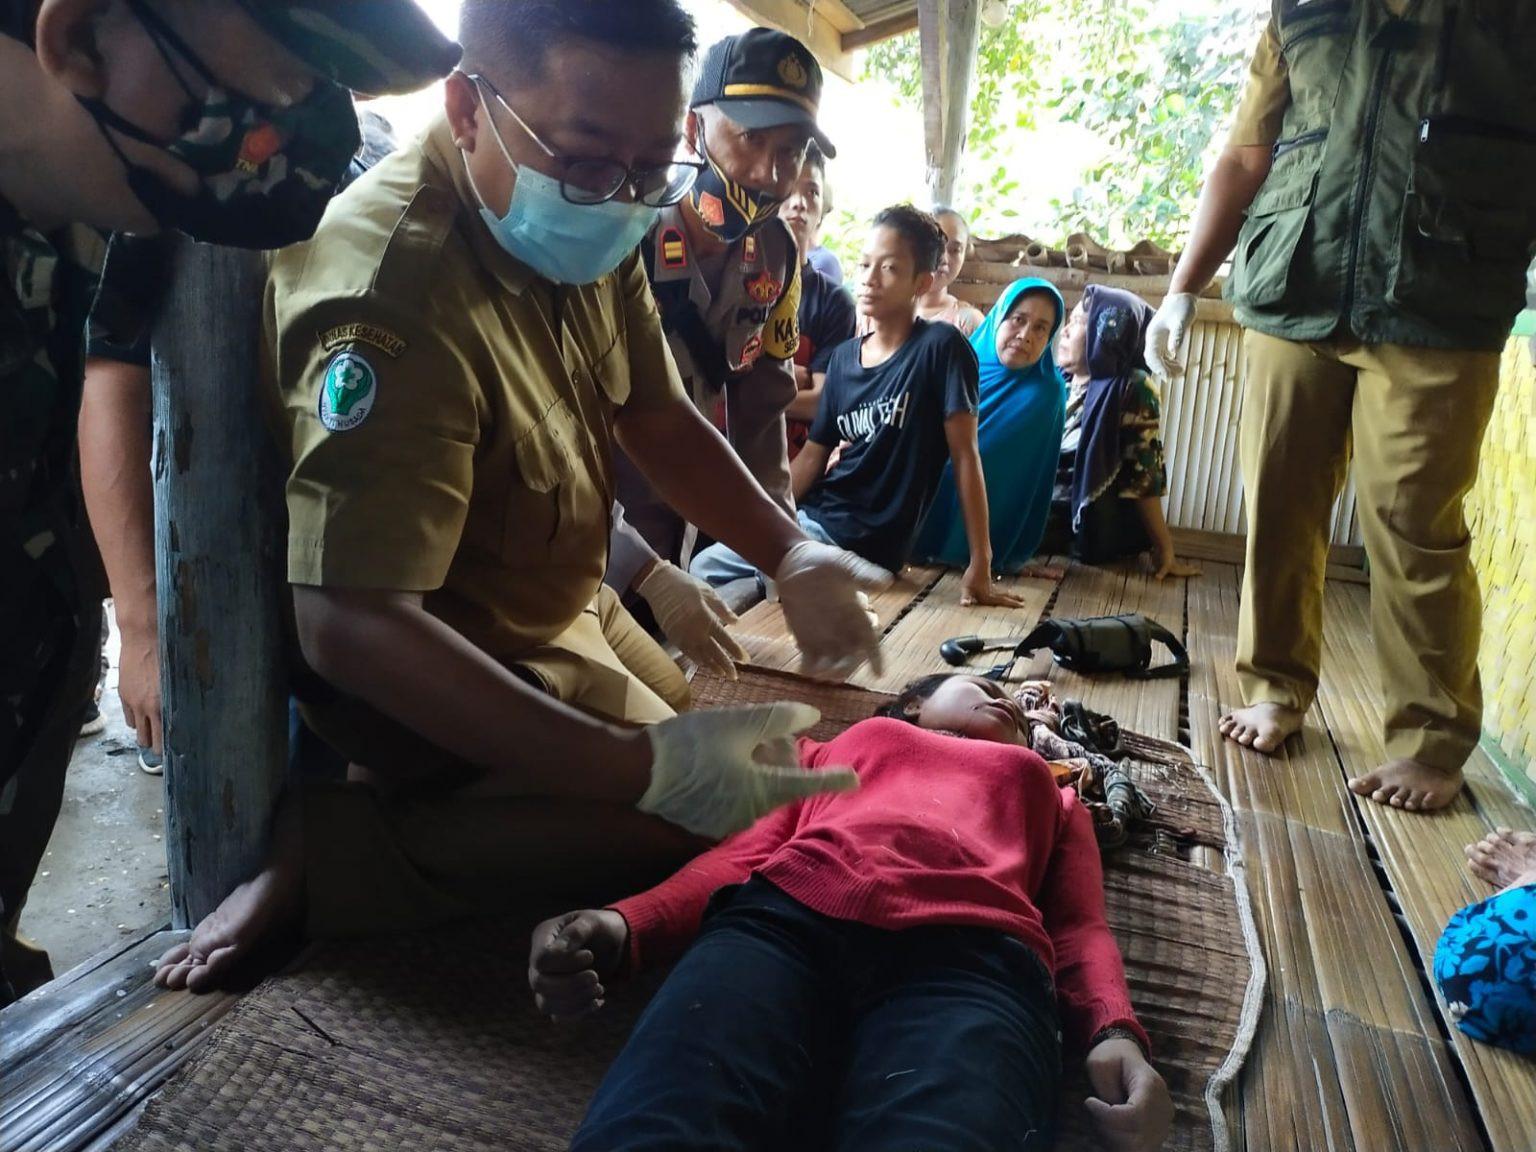 Remaja Putri Tepergok Pacaran di Kamar, Akhirnya Berbuat Nekat - JPNN.com